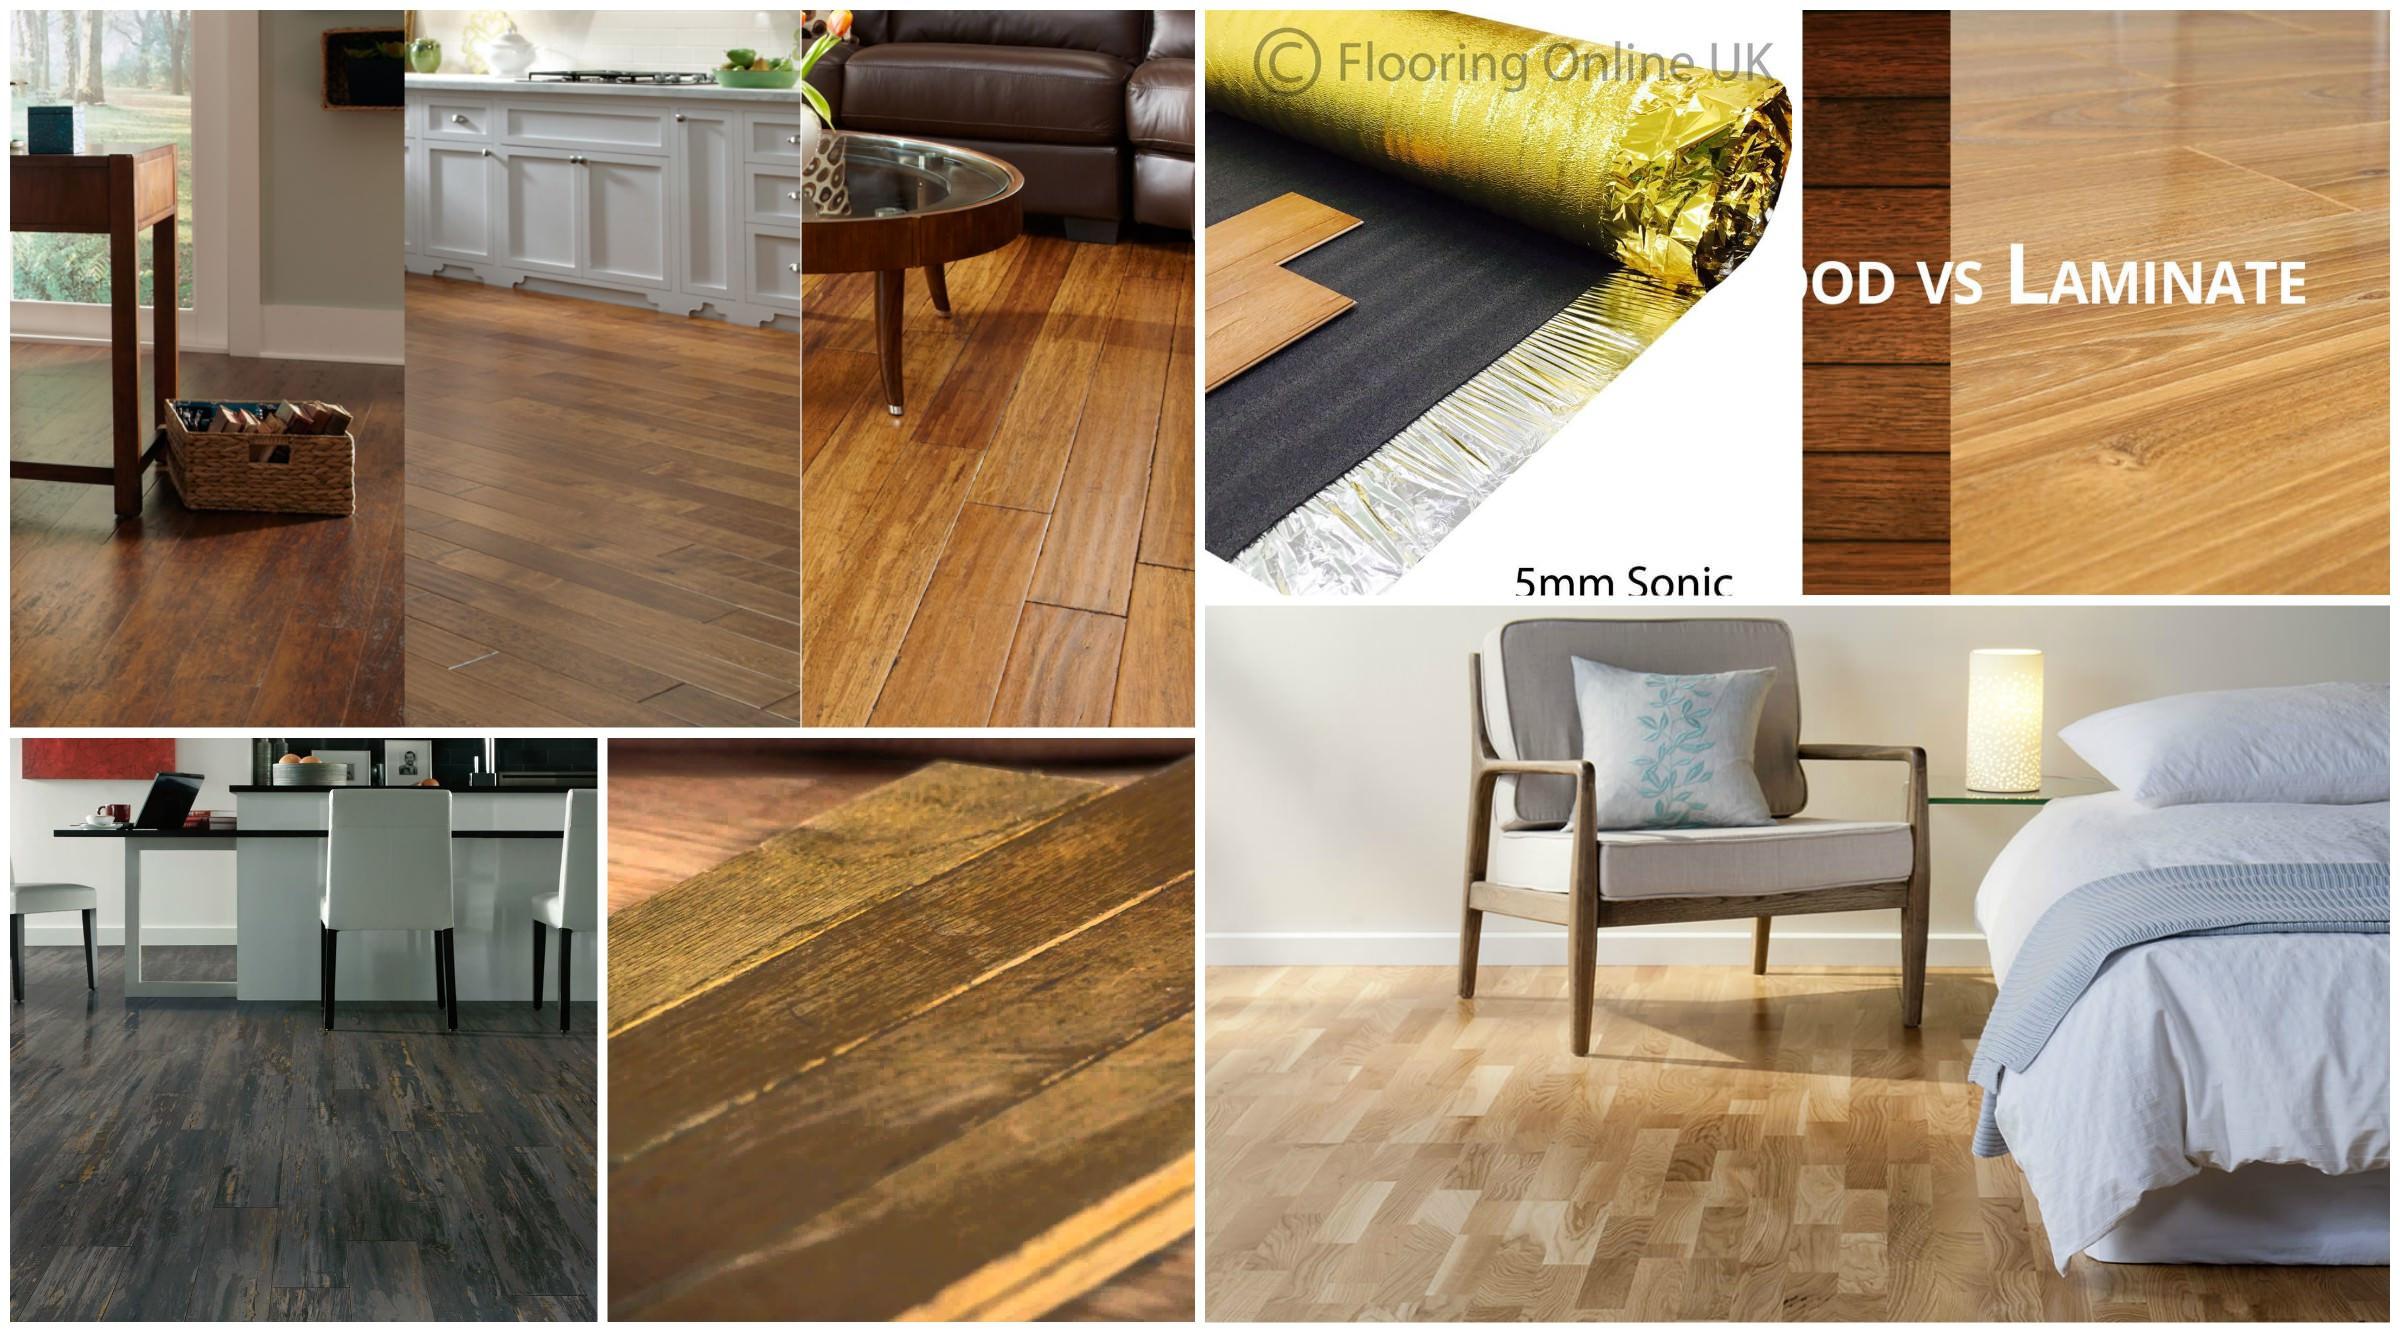 solid hardwood vs engineered hardwood vs laminate flooring of laminate flooring vs wood which one is the better lugenda for laminate flooring vs wood